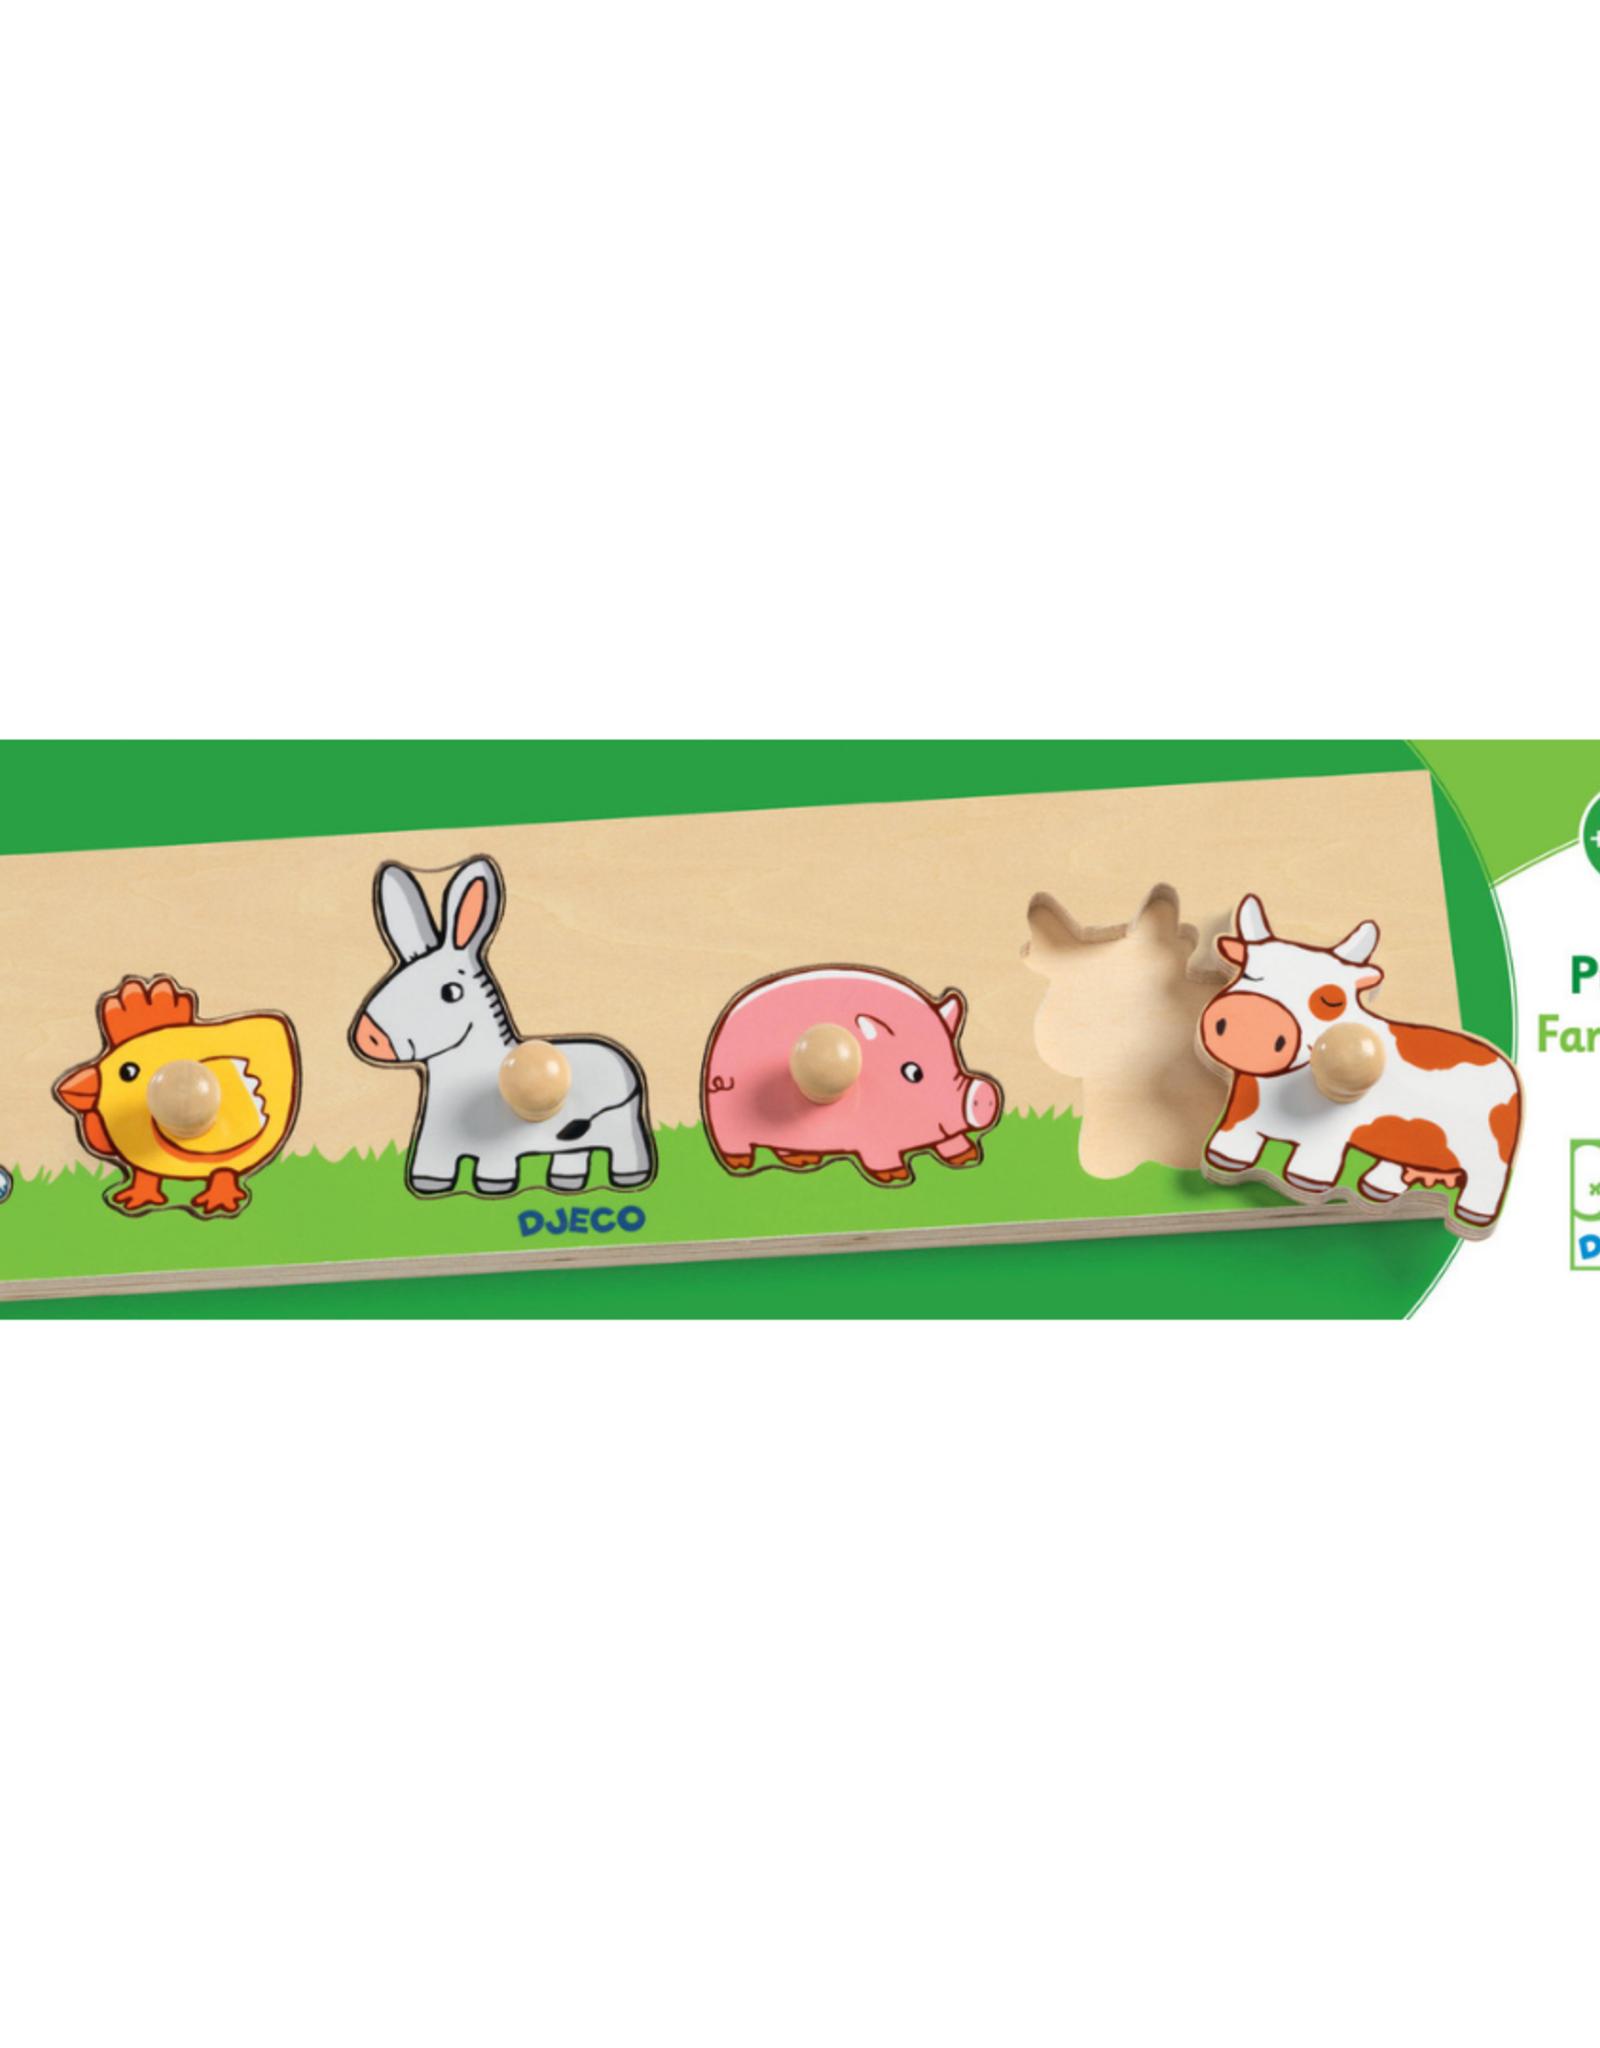 Djeco Djeco Wooden Puzzle Farm 'n' Co